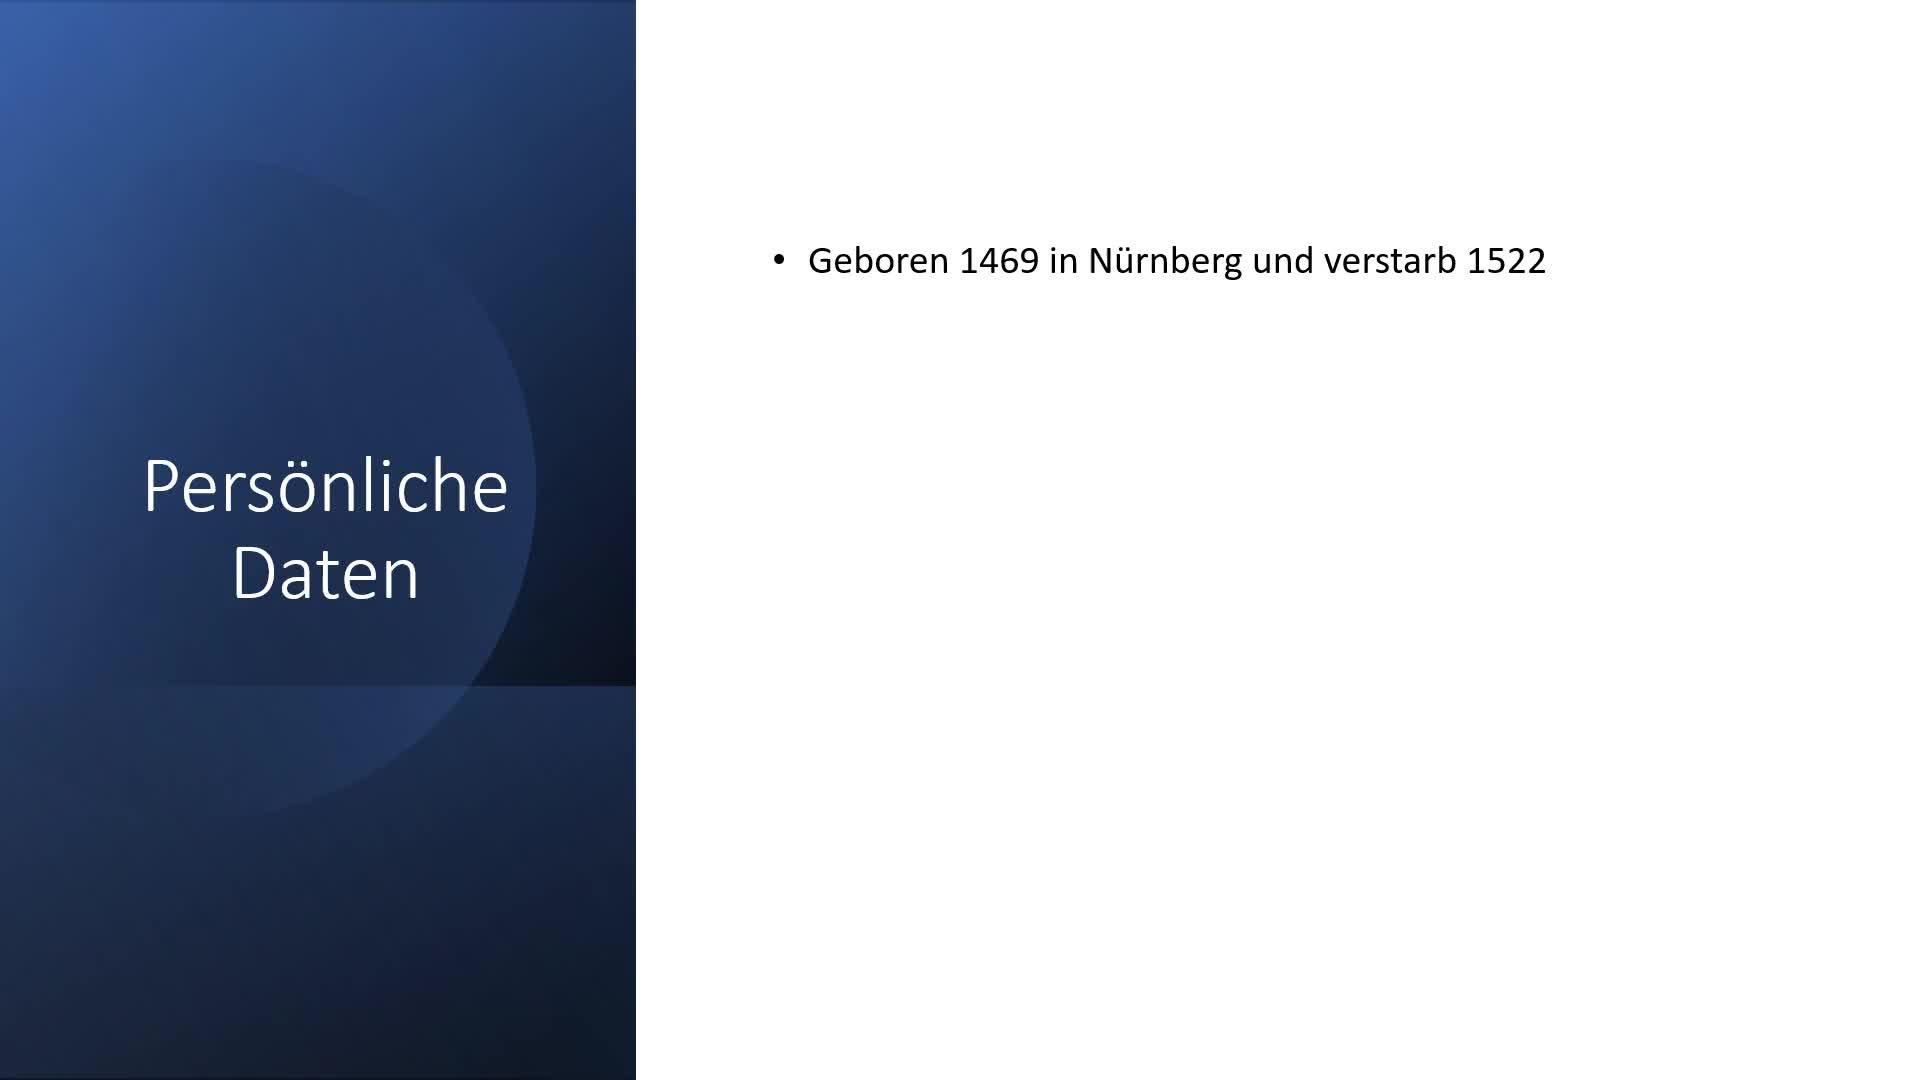 Johannes Werner preview image